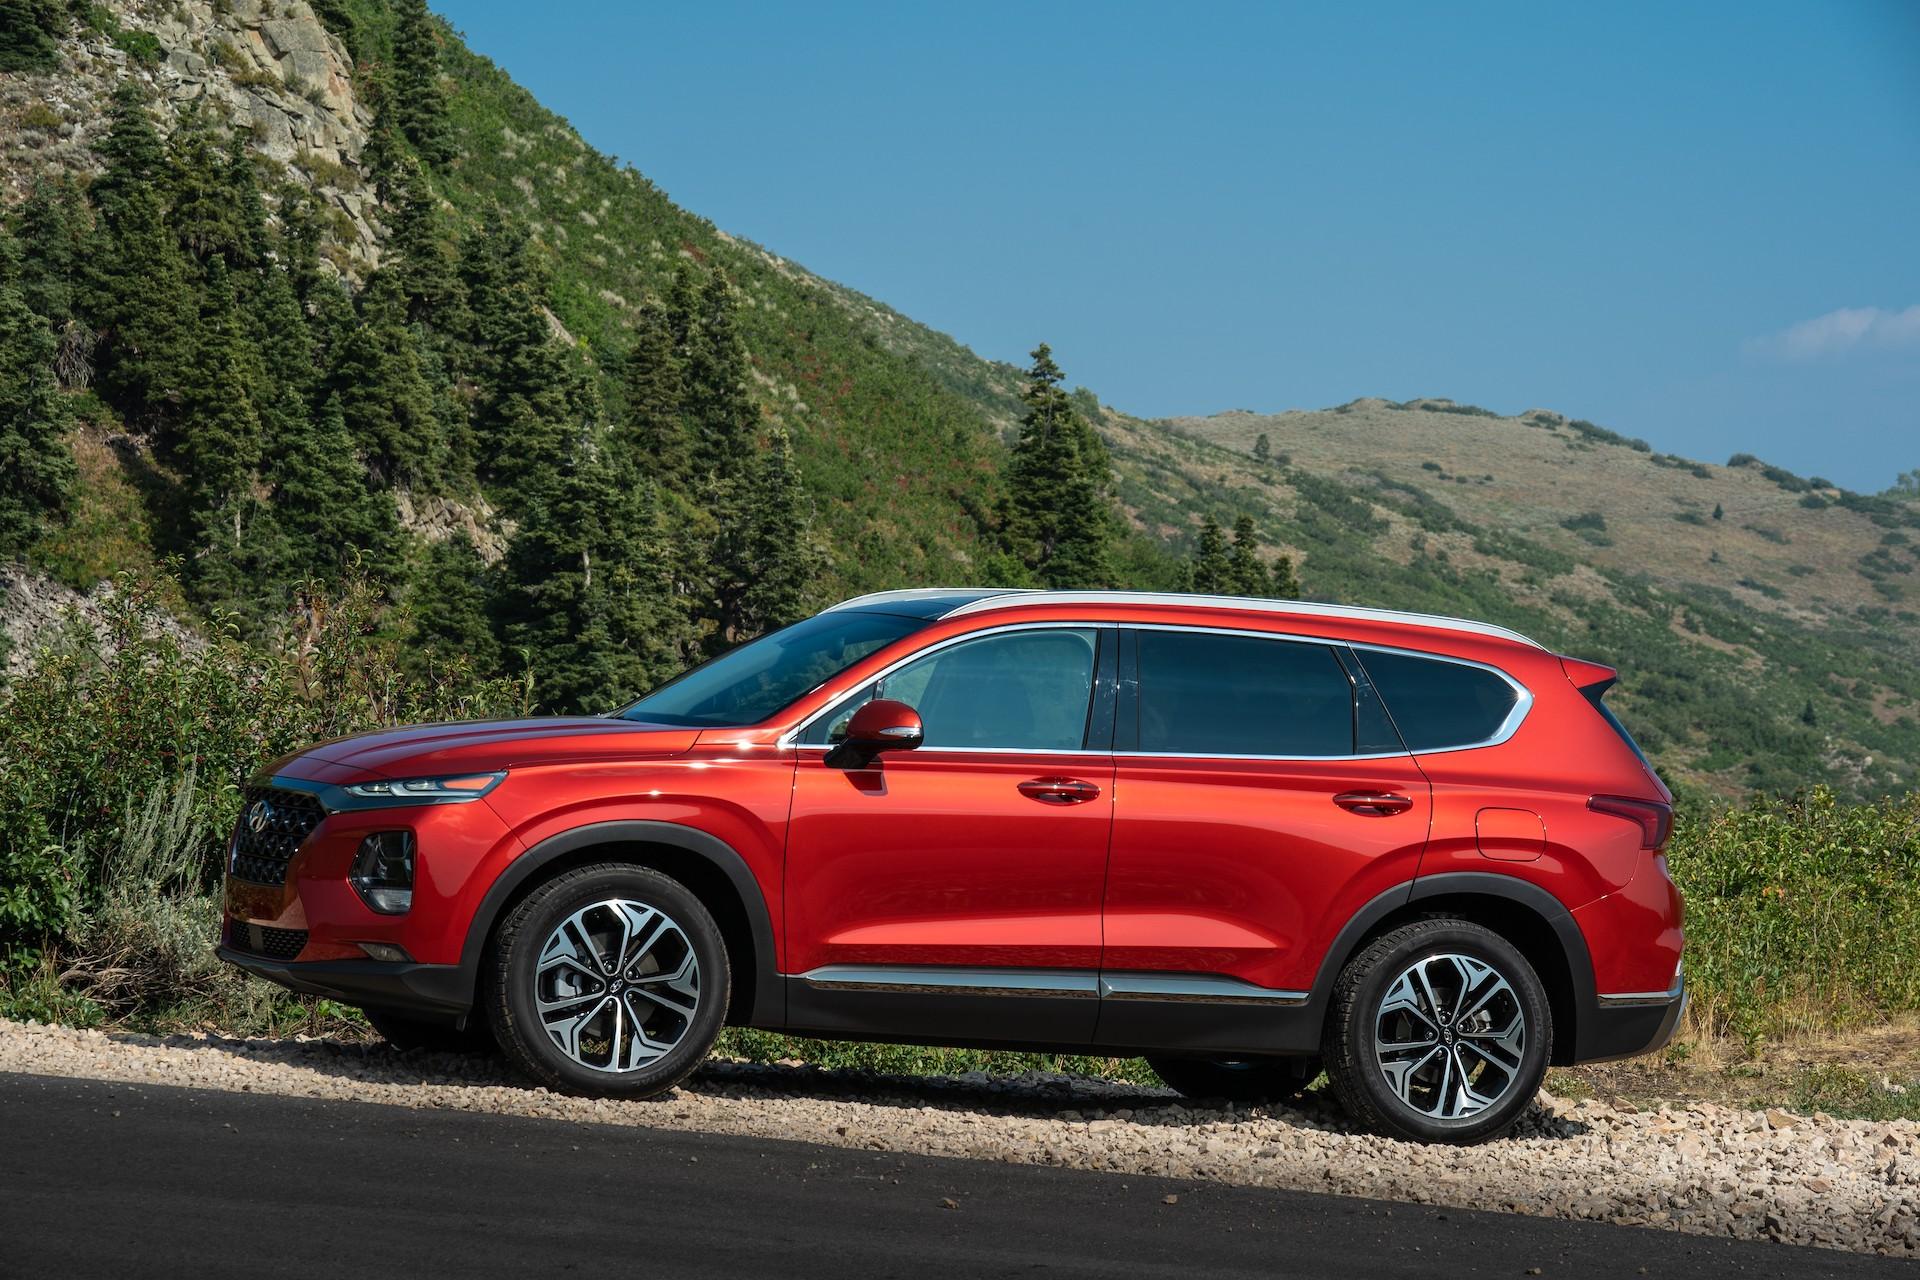 1 of 101 angular rear. 2020 Hyundai Santa Fe Vs 2020 Hyundai Tucson Compare Crossovers